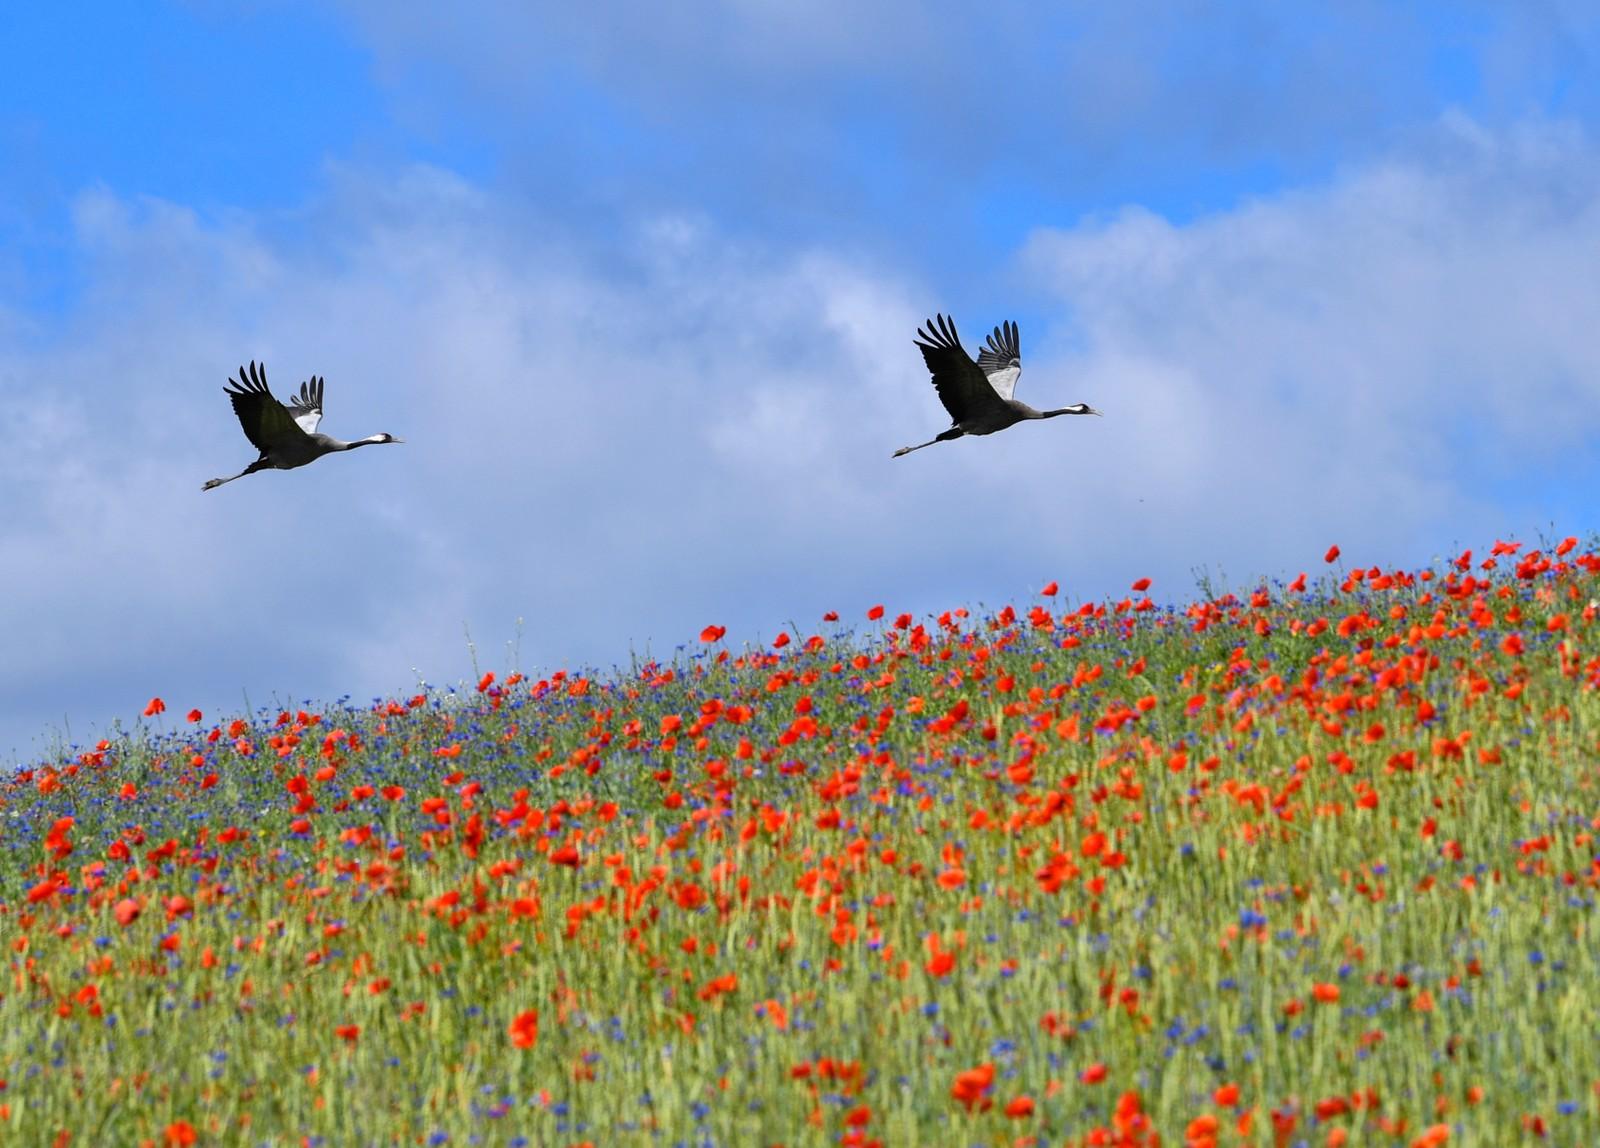 Traner flyr over en blomstereng i den økologiske landsbyen Brodowin i Tyskland.